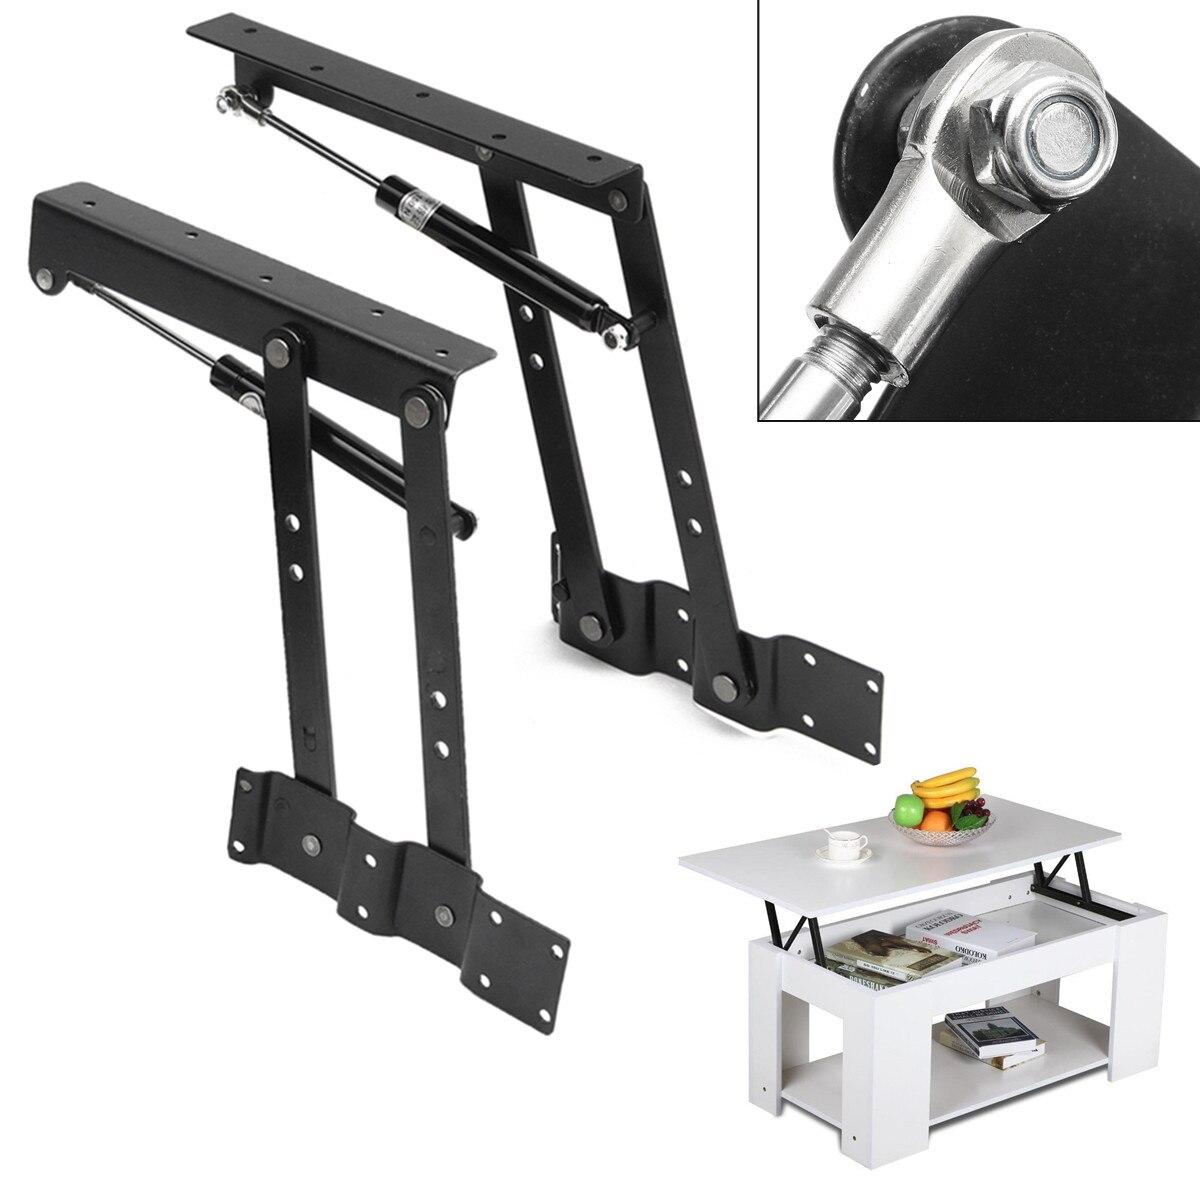 2PCS Lift Up Top Coffee Table Lifting Frame Mechanism Spring Hinge Hardware DIY Lift UP Spring Hinge